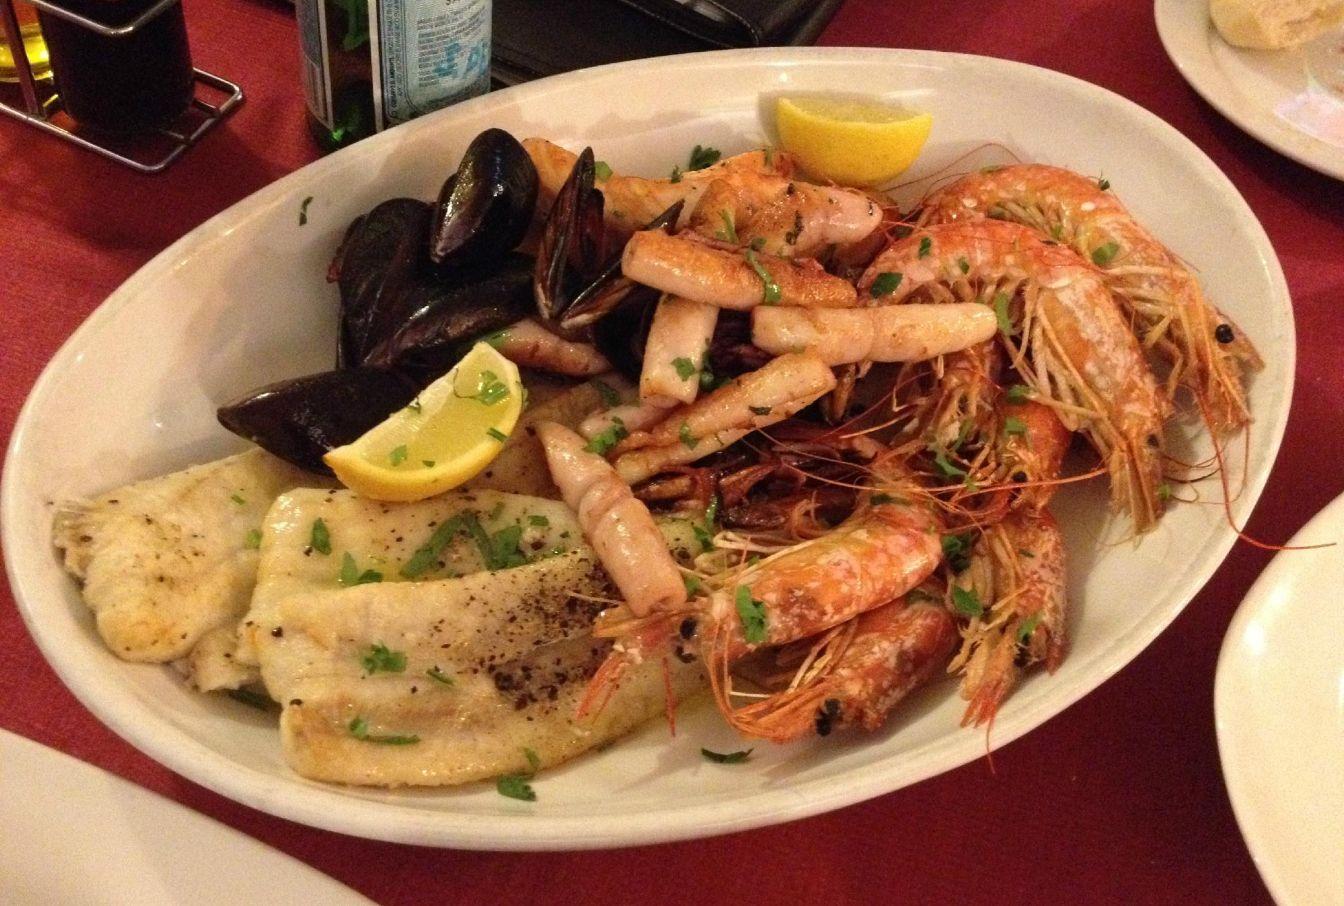 Foto 54 de Restaurante en Arona   Restaurante Locanda Italiana